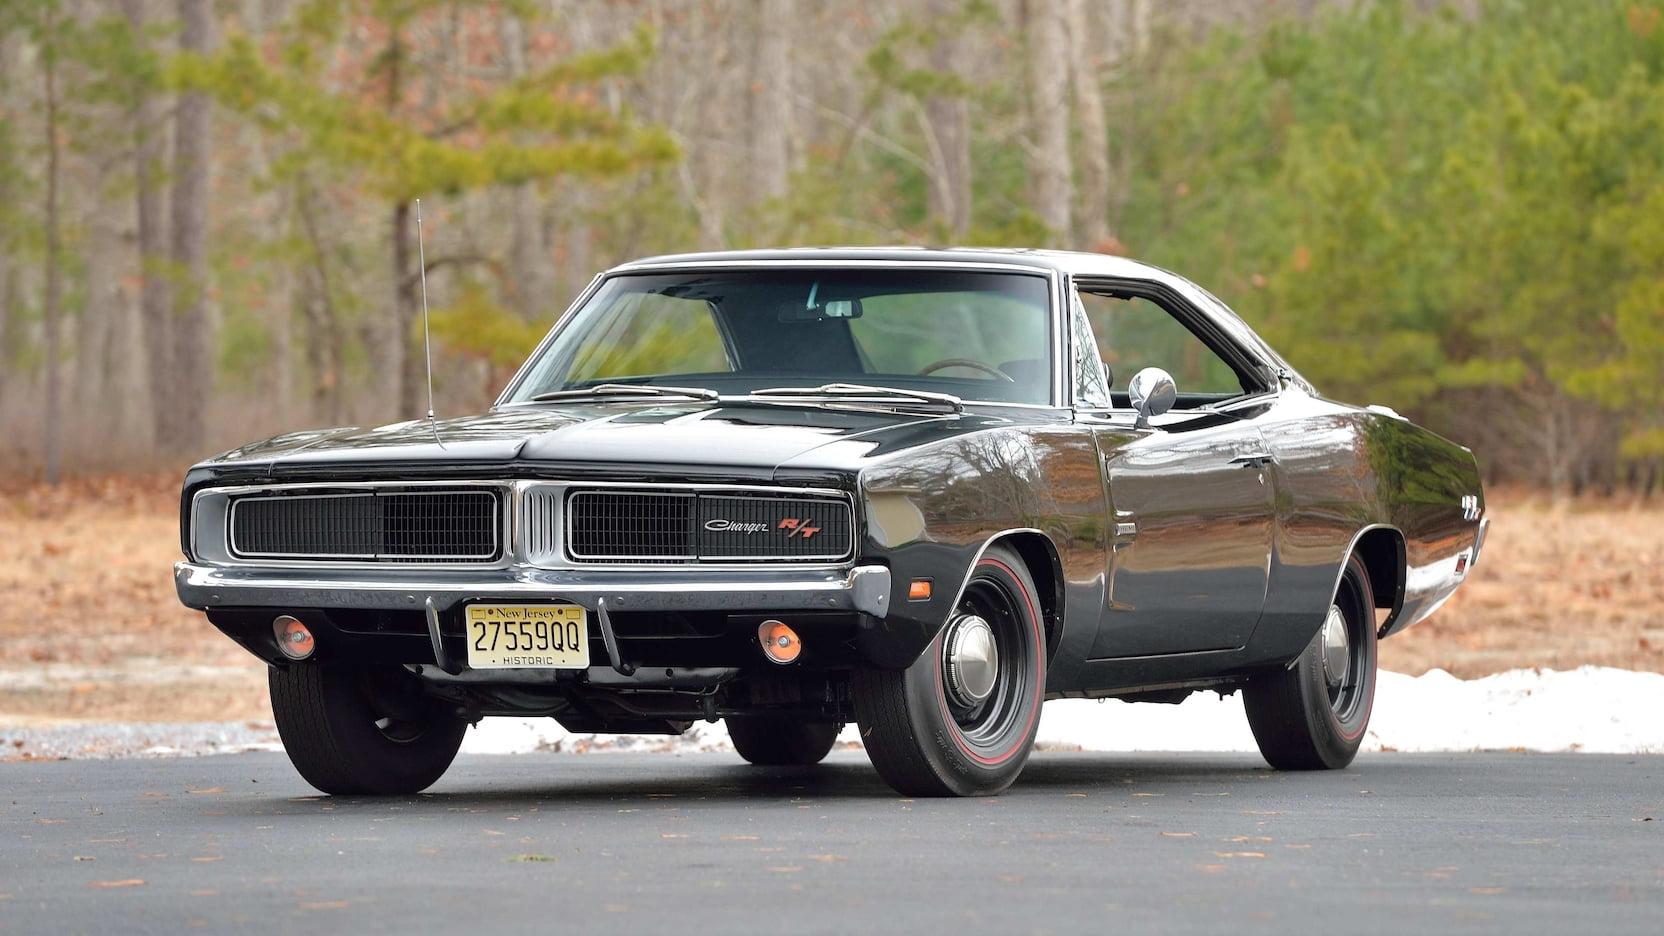 1969 Dodge Charger R/T Hemi